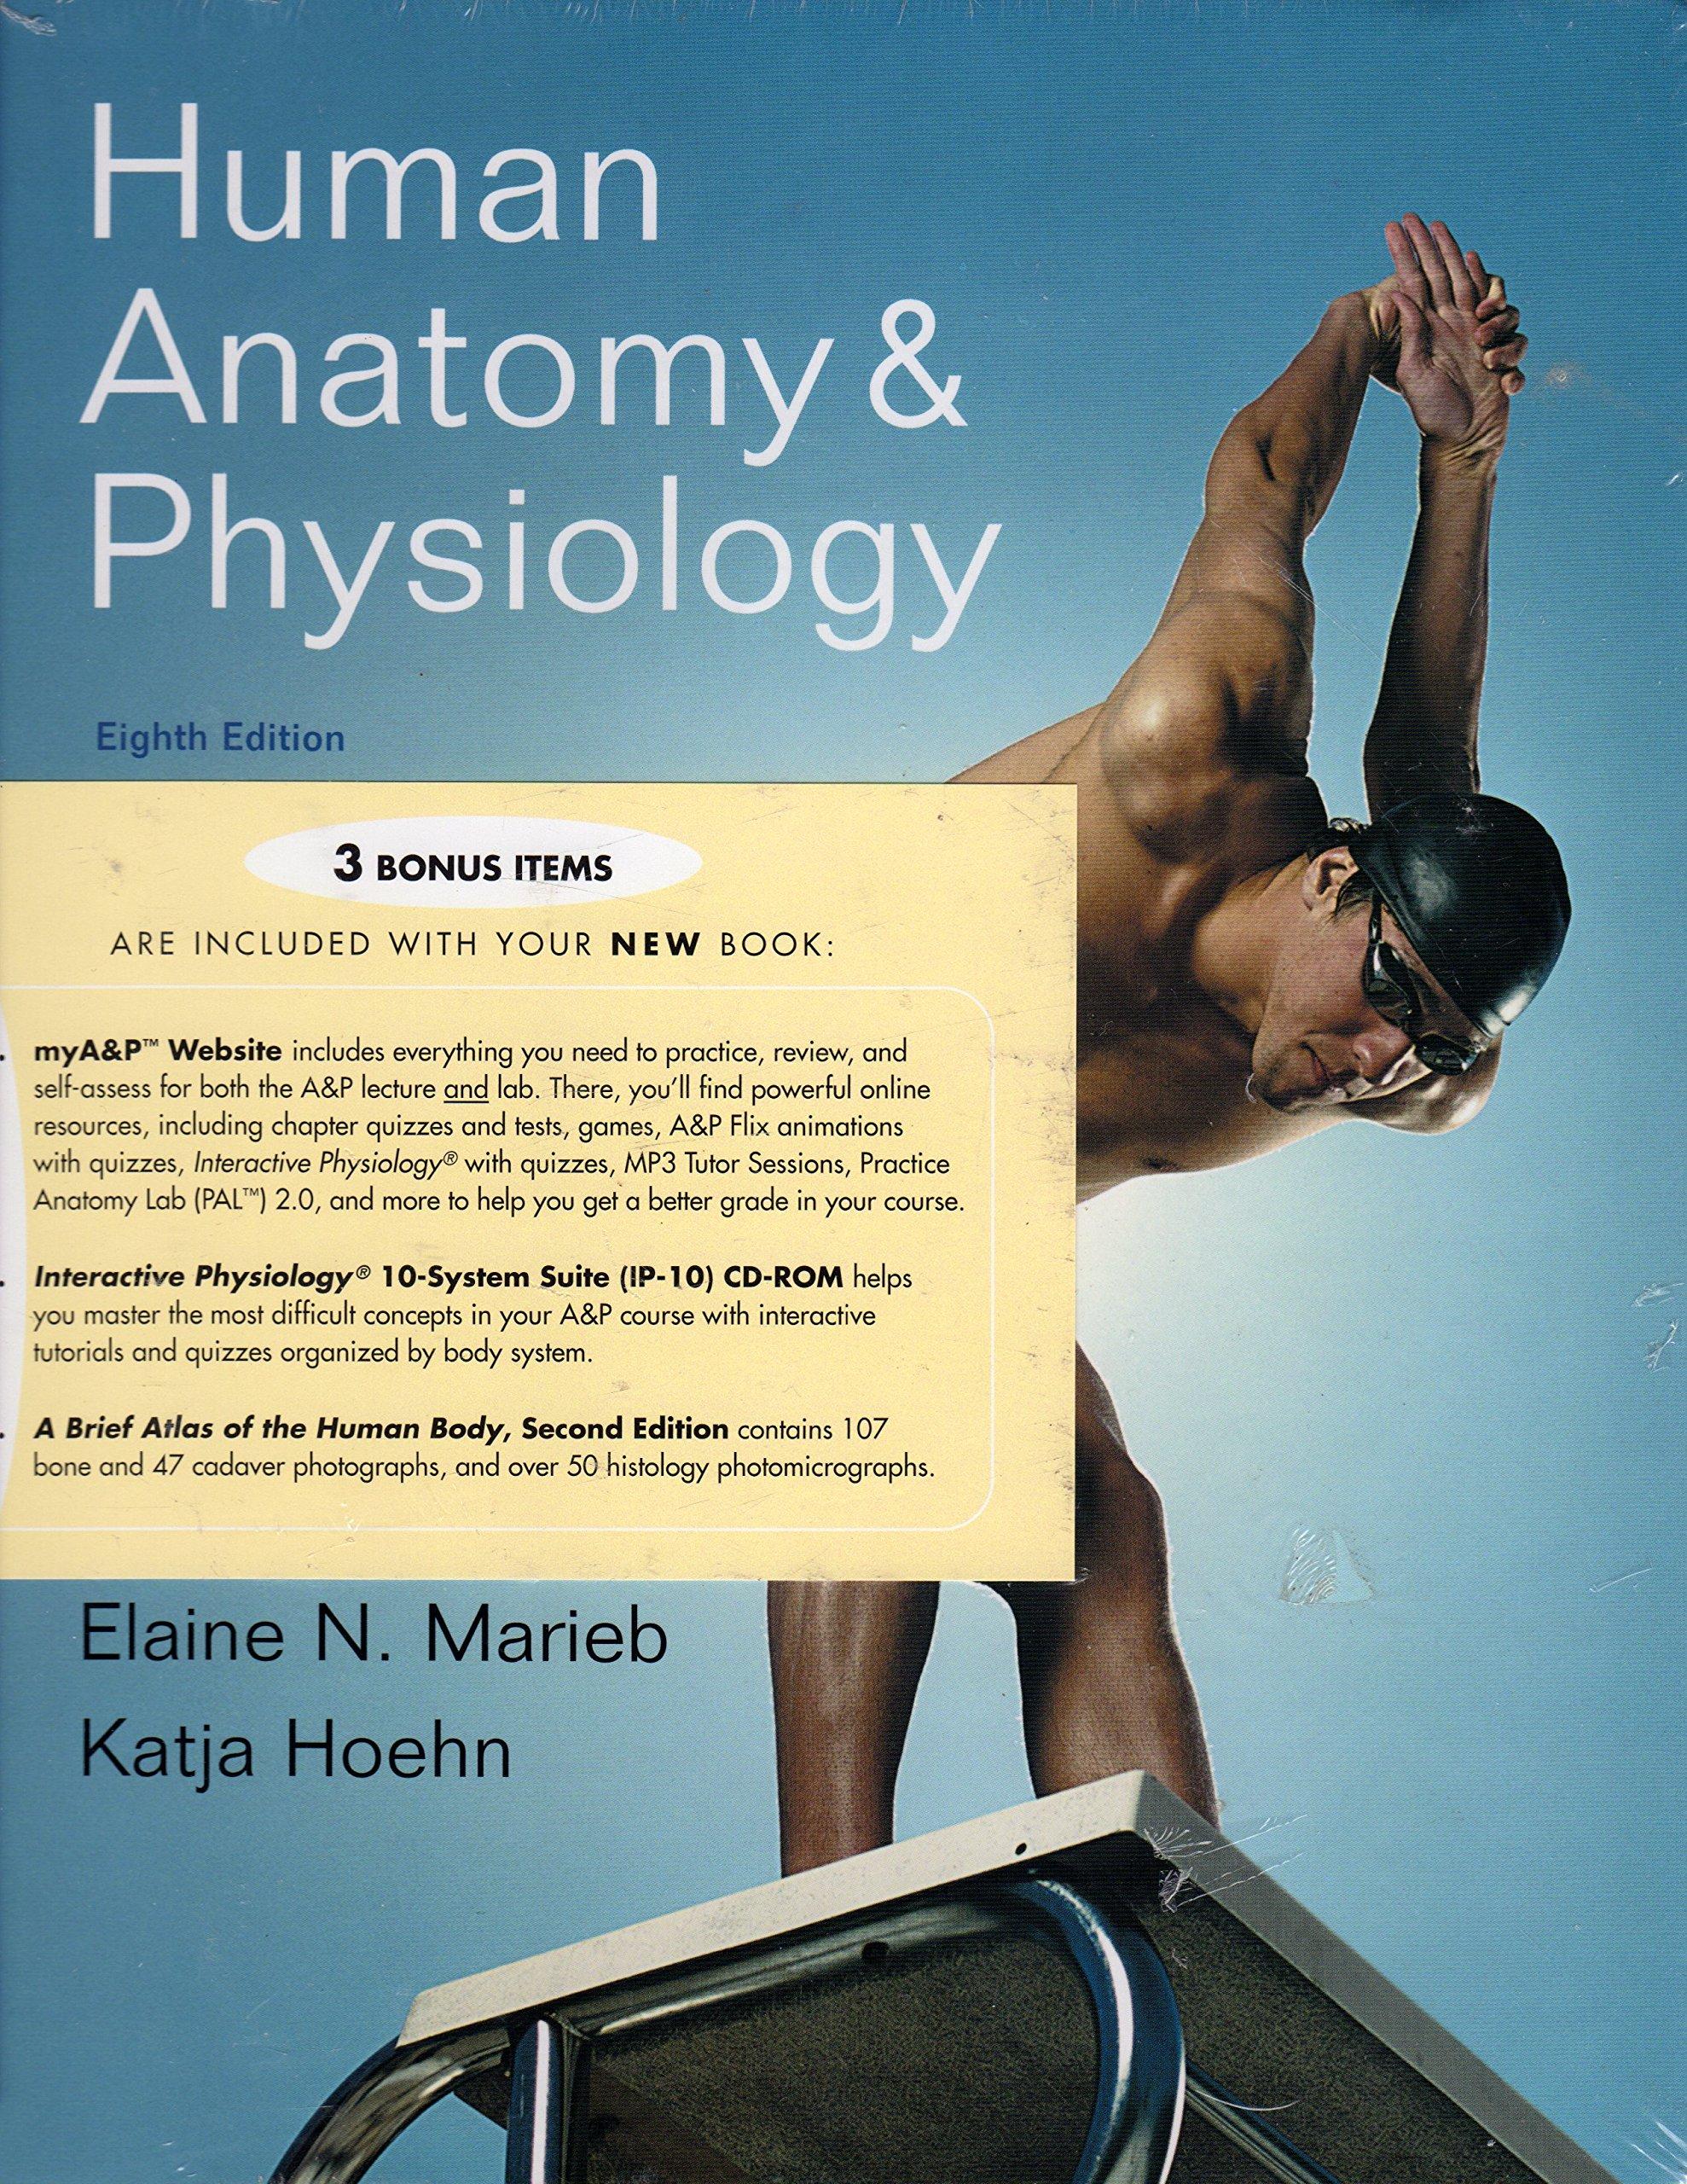 Human Anatomy & Physiology, 8th Edition, with Bonus Pack: MyA&P ...